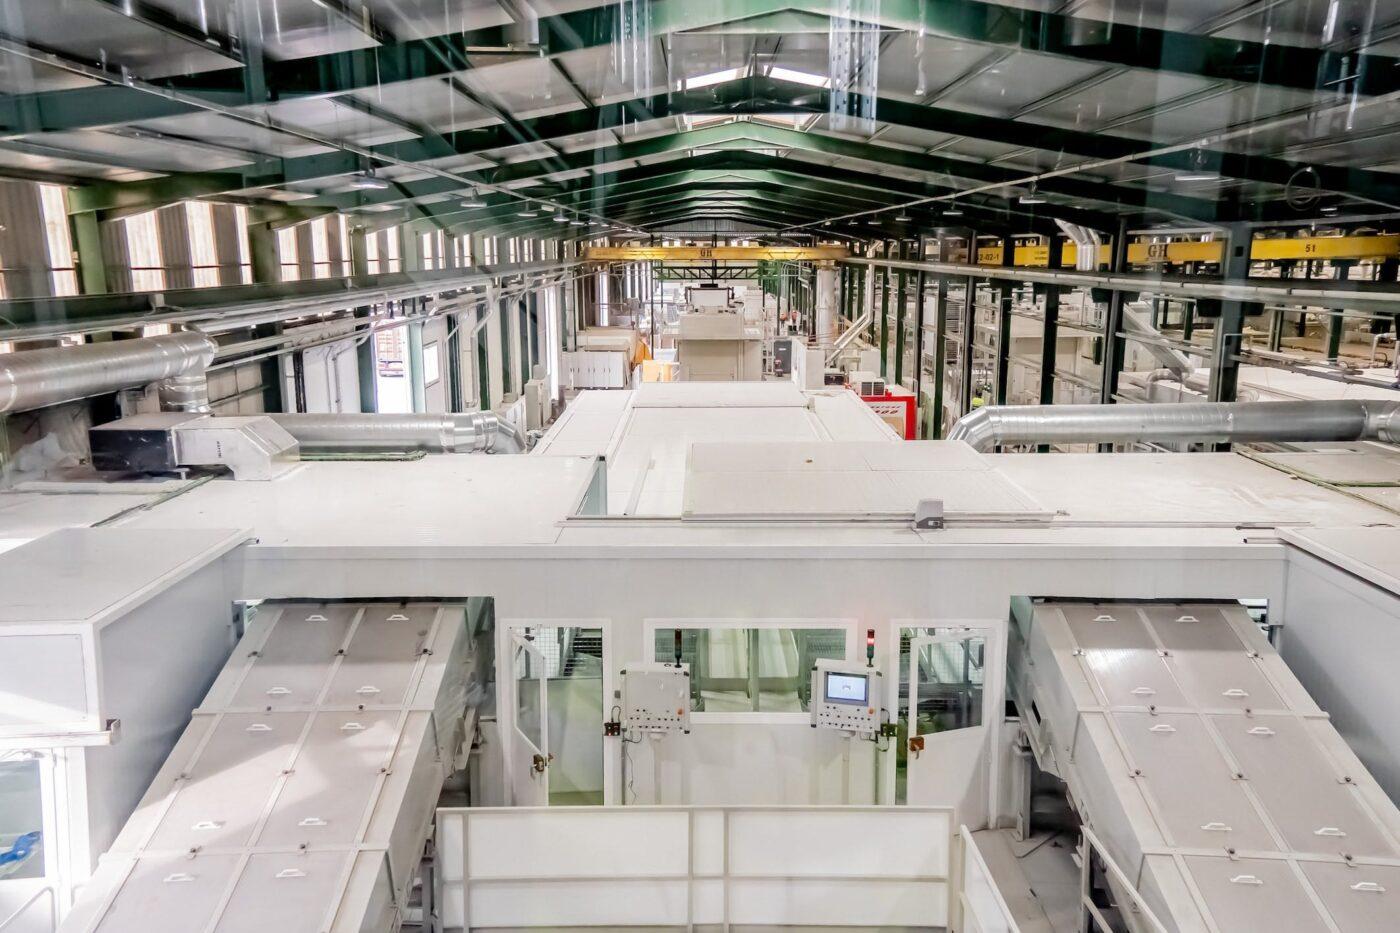 Image of Interior Planta Silestone Cosentino HQ 1 6 in Cosentino, winner of the Spanish National Innovation Award 2021 - Cosentino